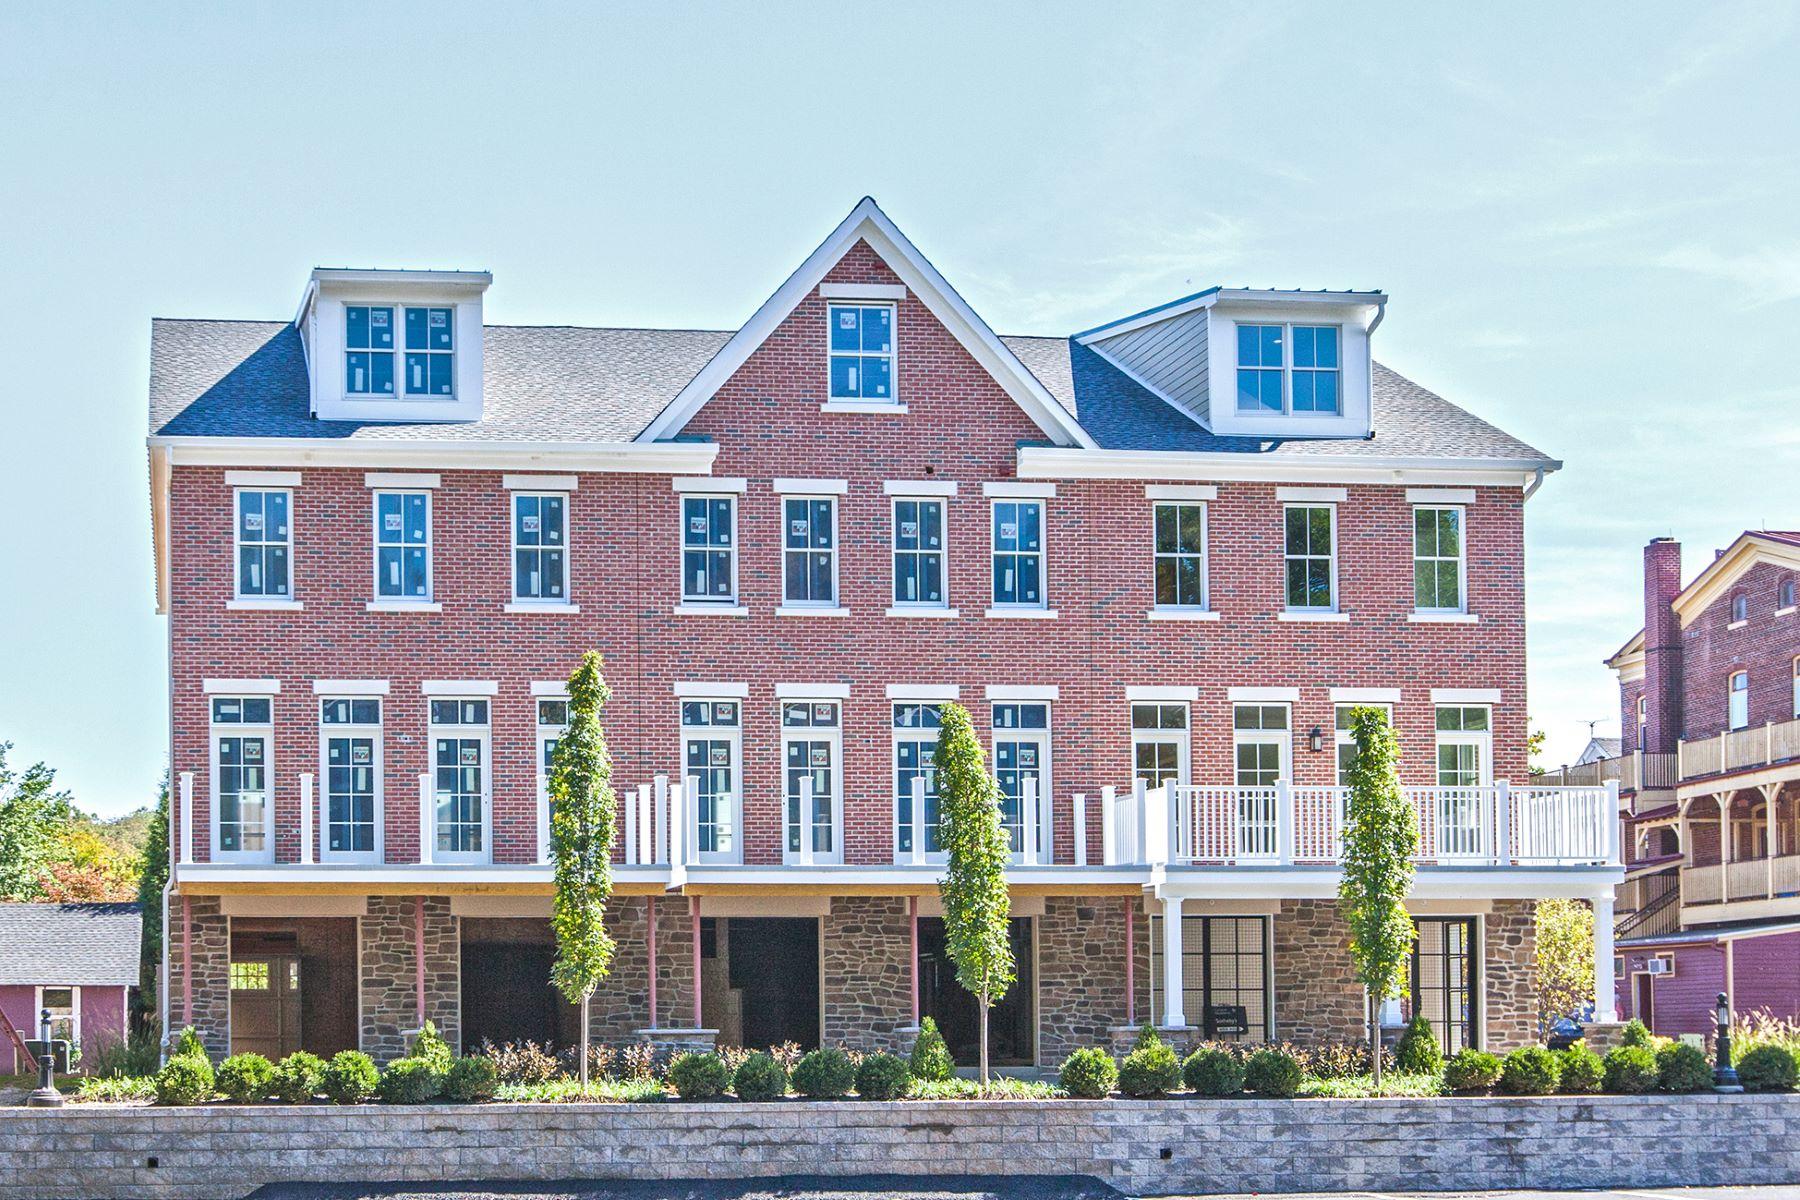 Таунхаус для того Продажа на Twenty Outstanding Waterfront Townhouses 7 2nd Street B1 Frenchtown, Нью-Джерси 08825 Соединенные Штаты